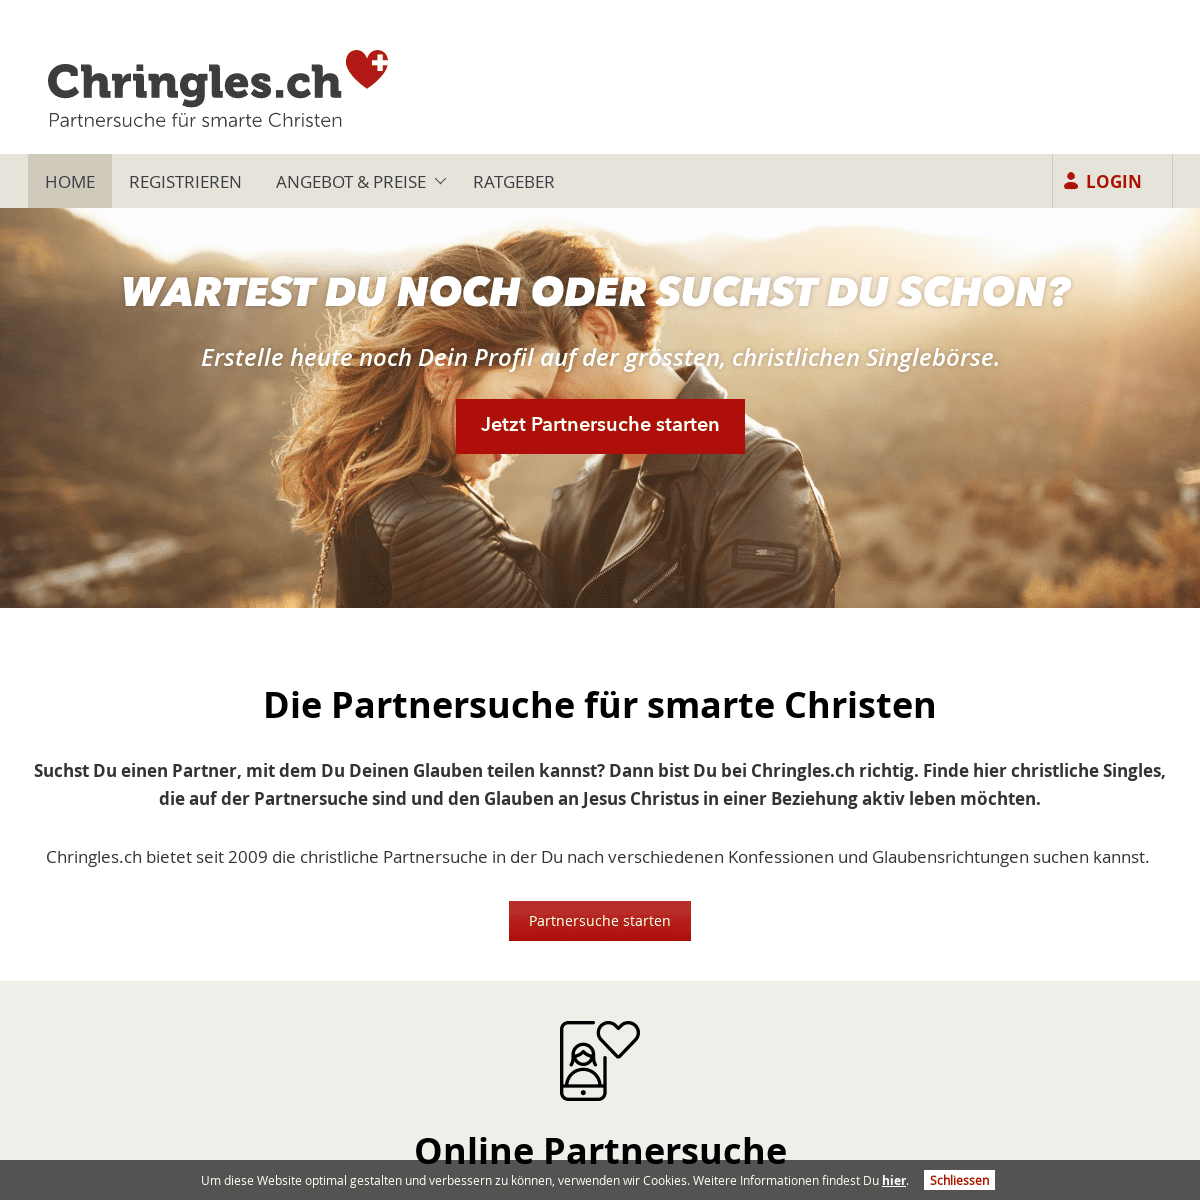 ArchiveBay.com - chringles.ch - Partnersuche für smarte Christen 😍 - Chringles.ch